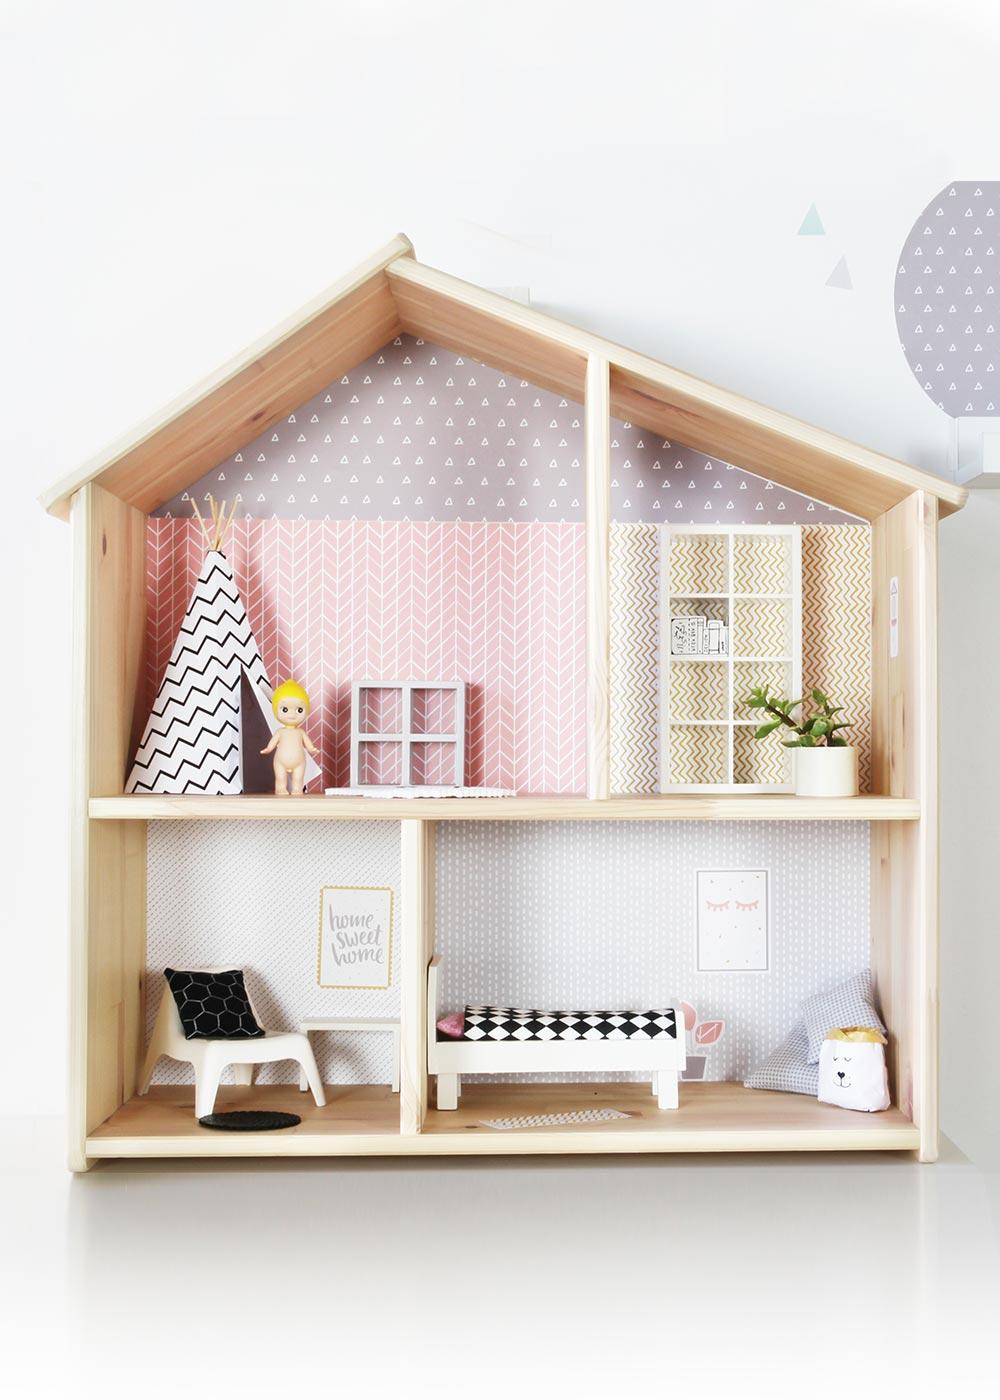 Ikea Flisat Puppenhaus Tapete Lille Stuba rosa hellgrau Frontansicht